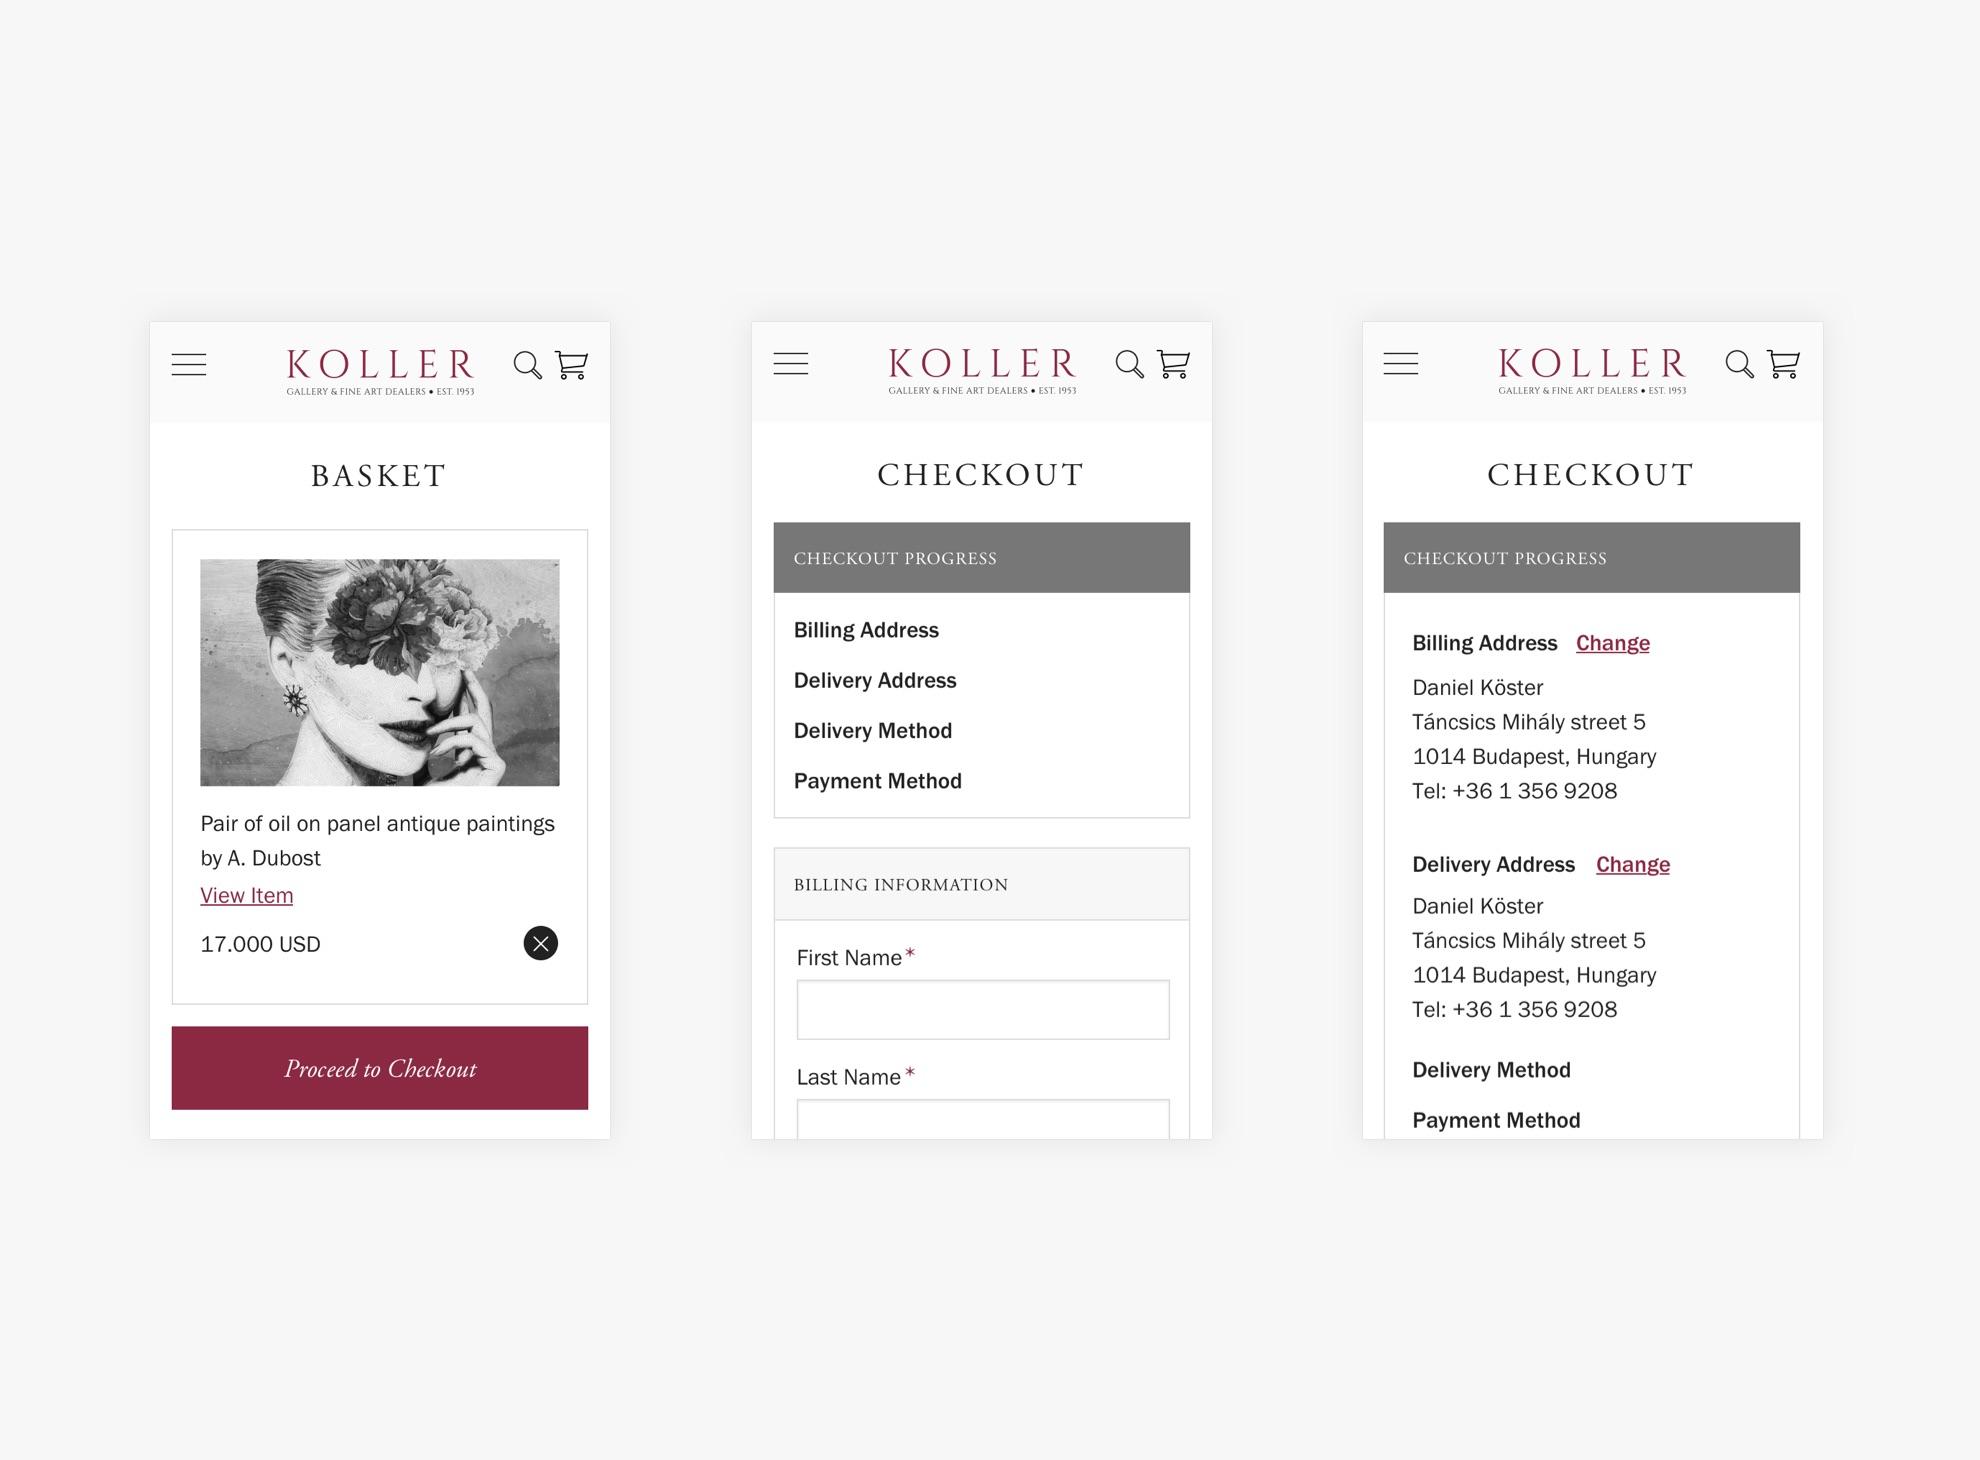 Koller Galéria - Reszponzív webáruház - Üzleti reszponzív webáruház készítés